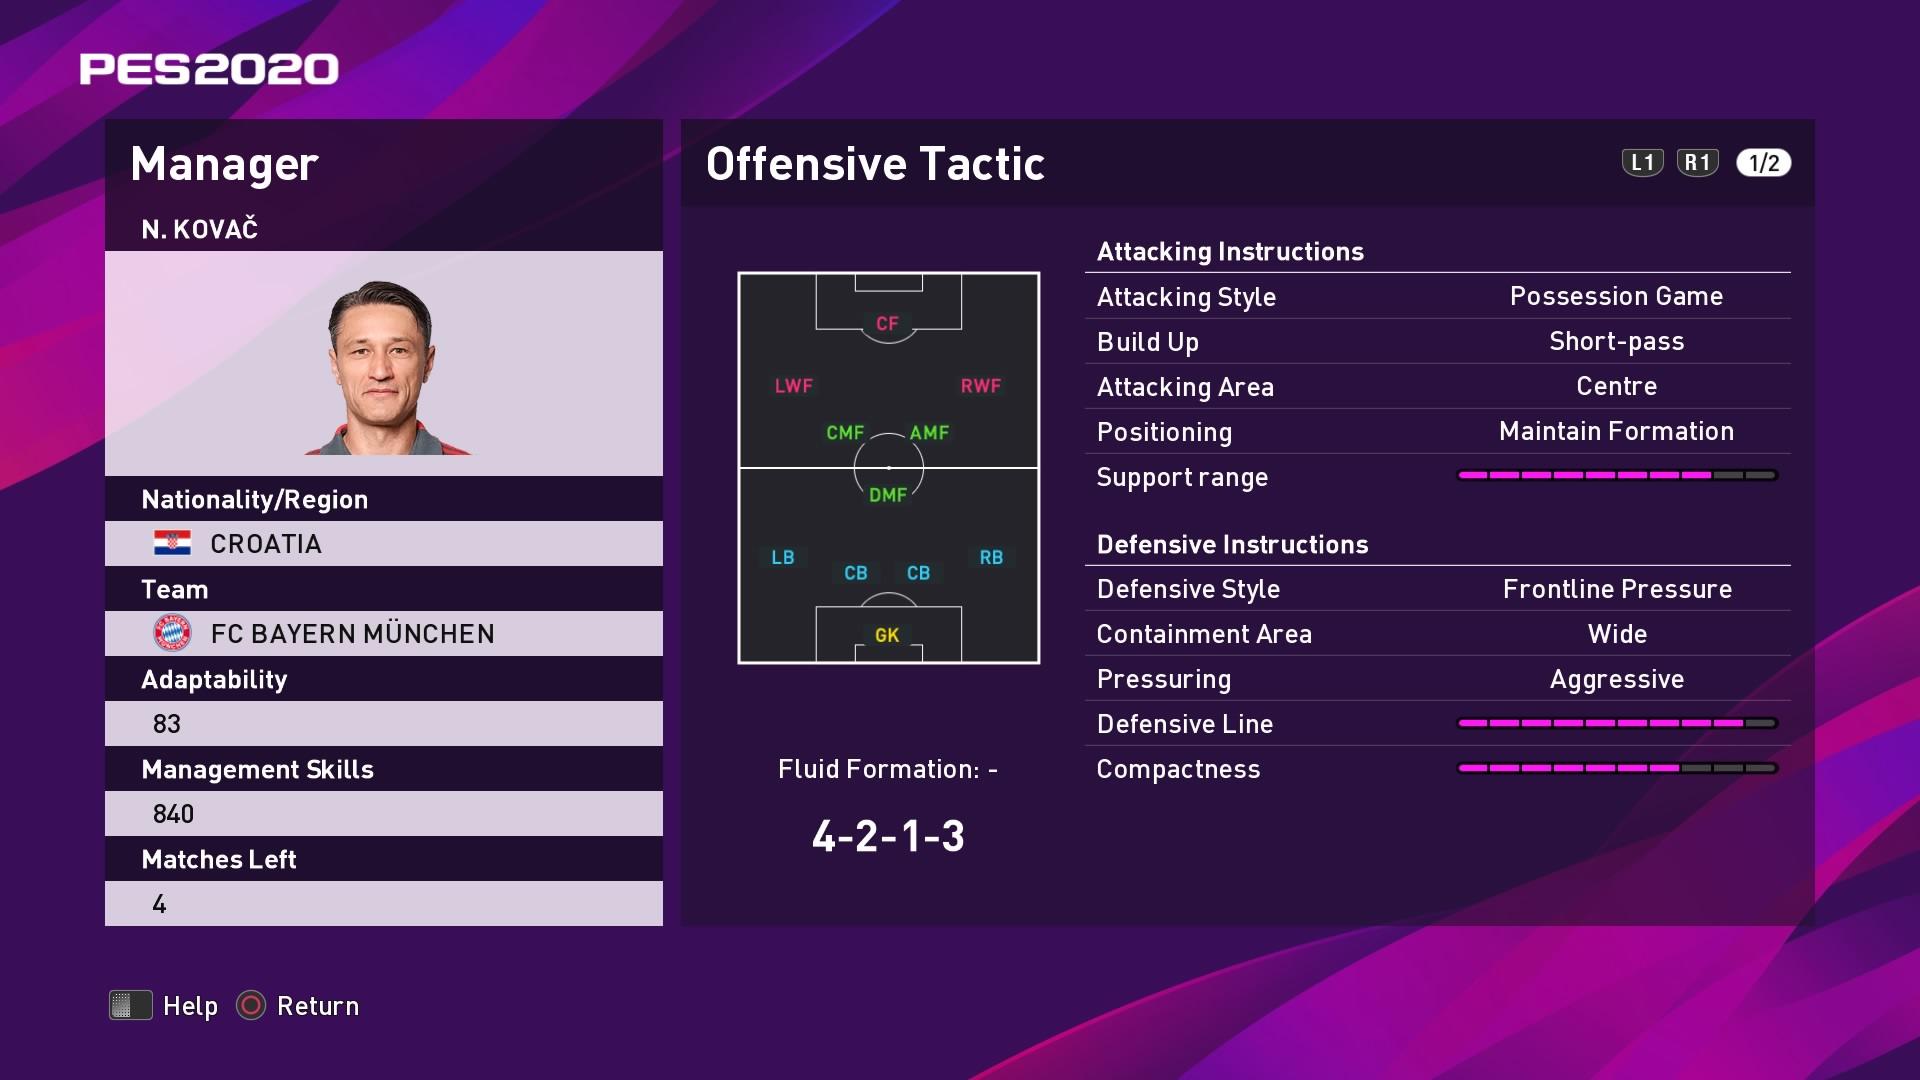 Niko Kovač Offensive Tactic in PES 2020 myClub